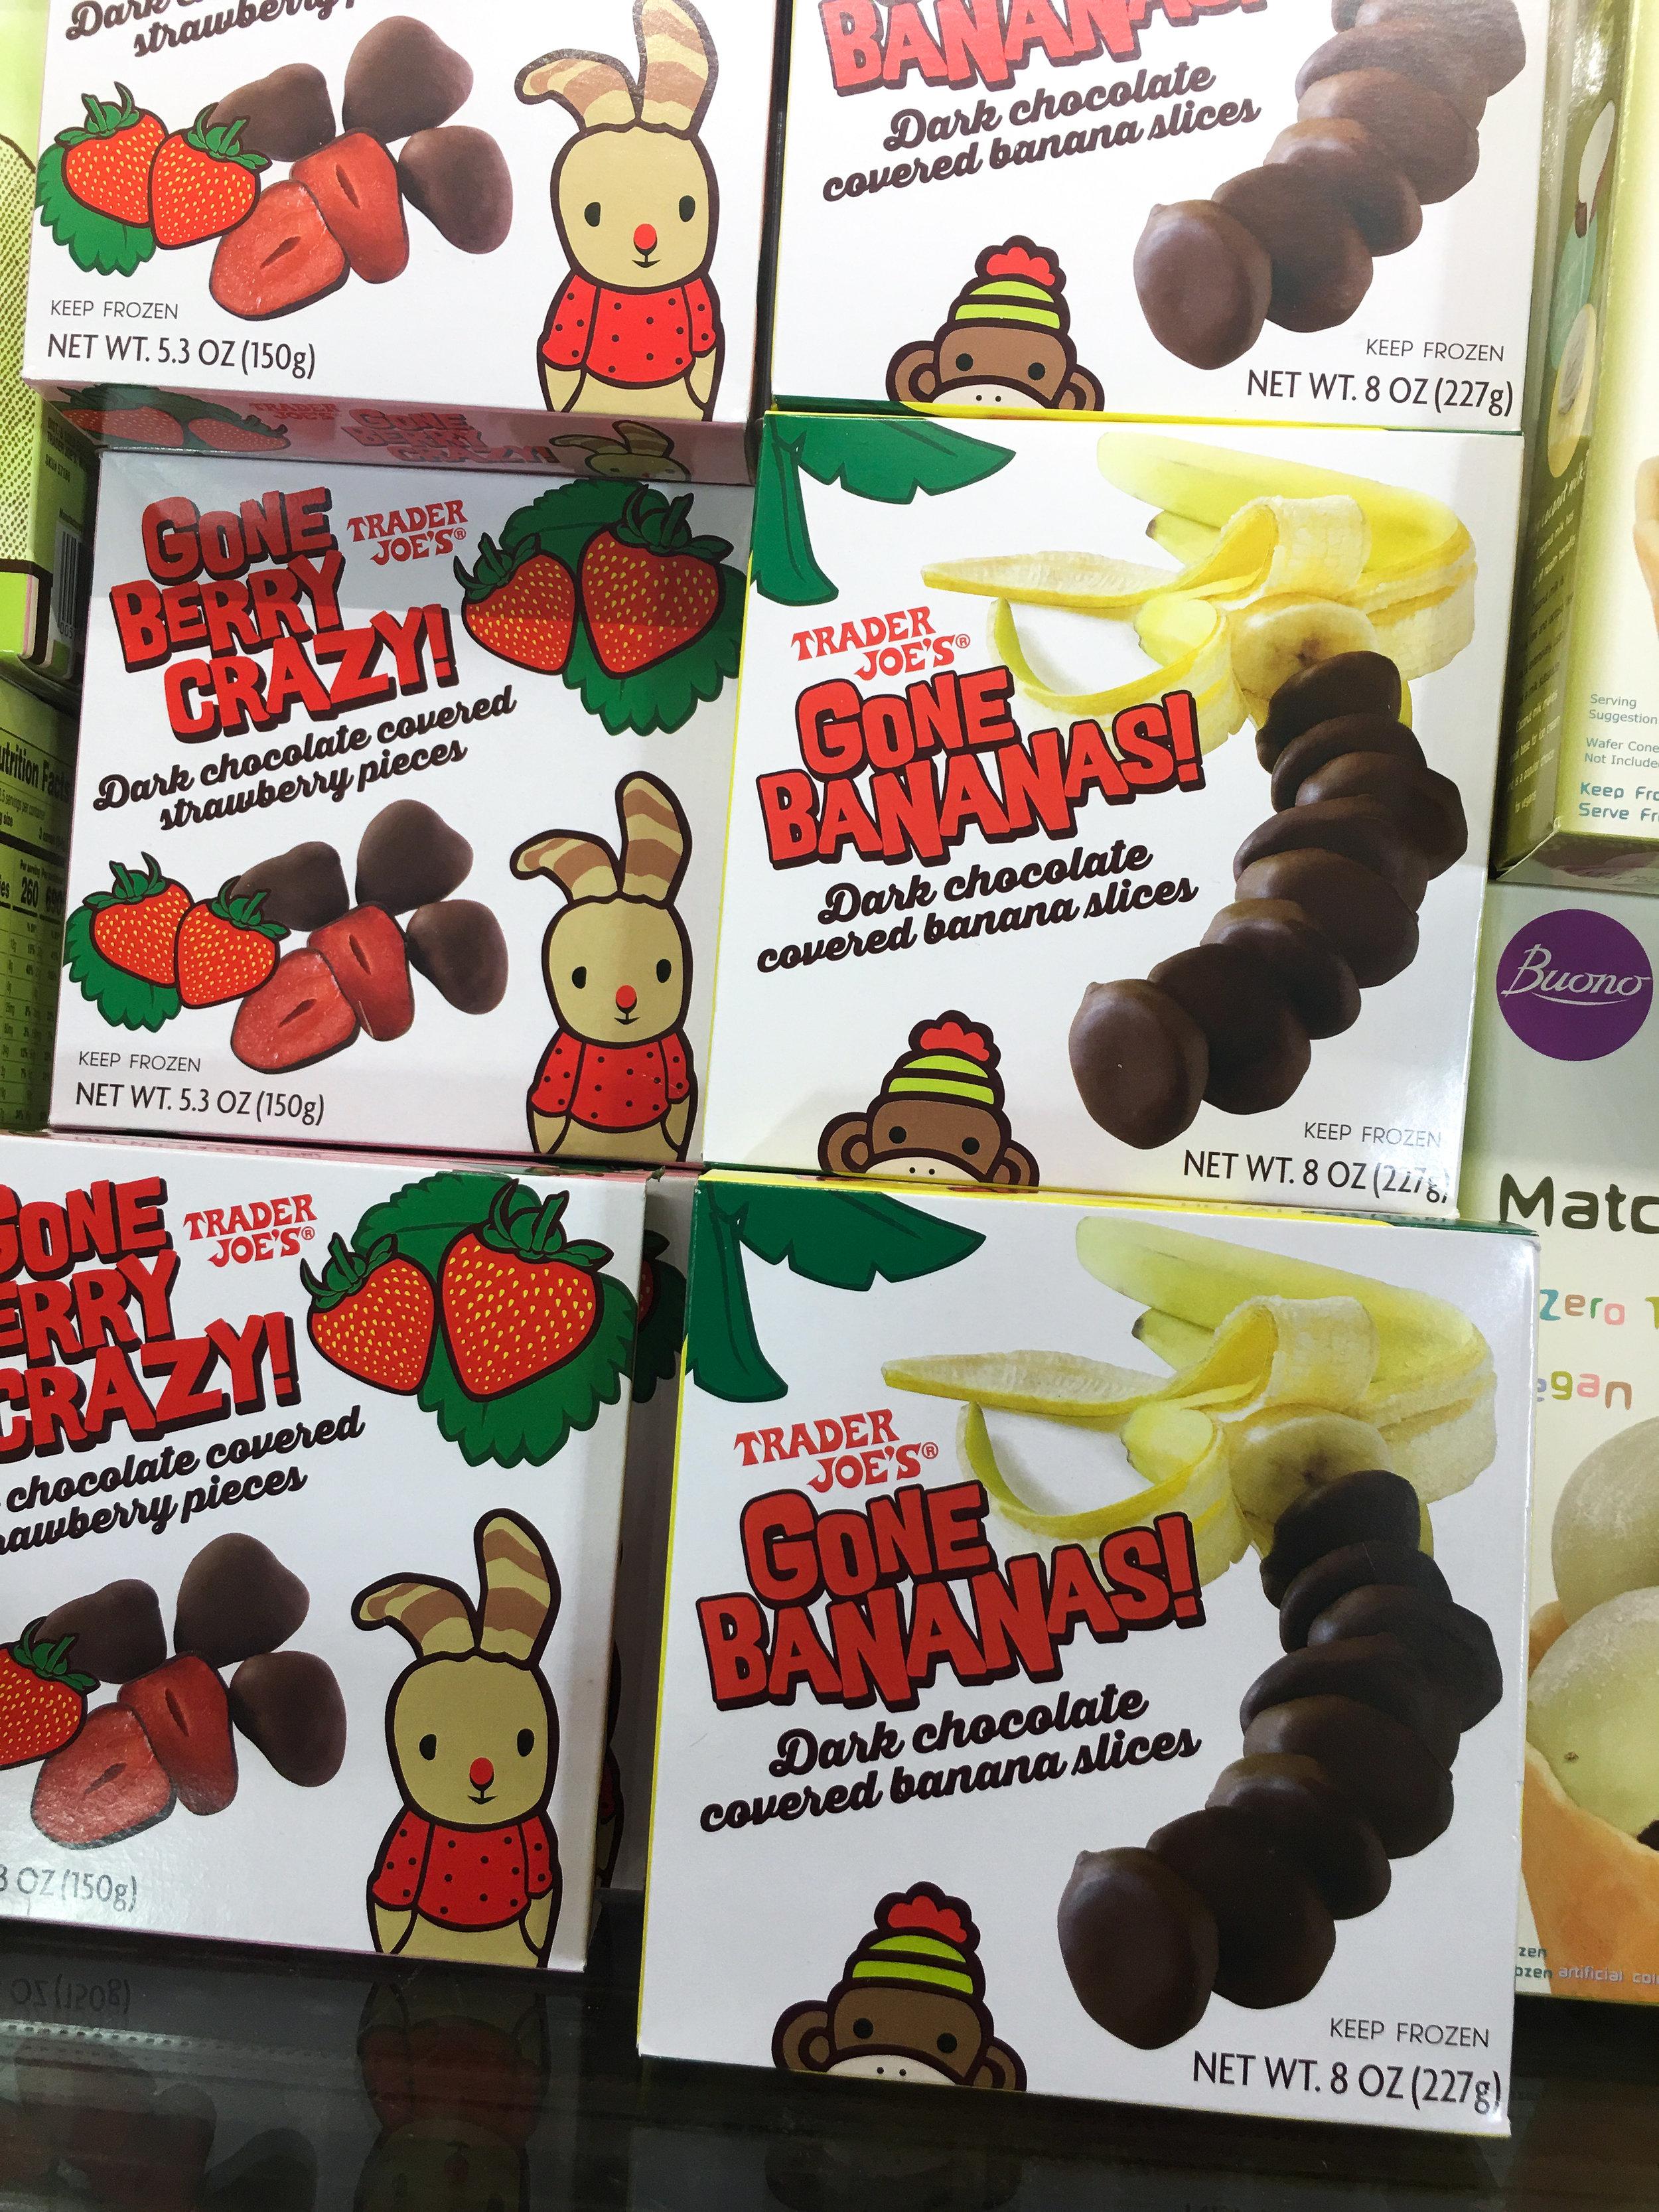 Chocolate Covered Berries & Bananas